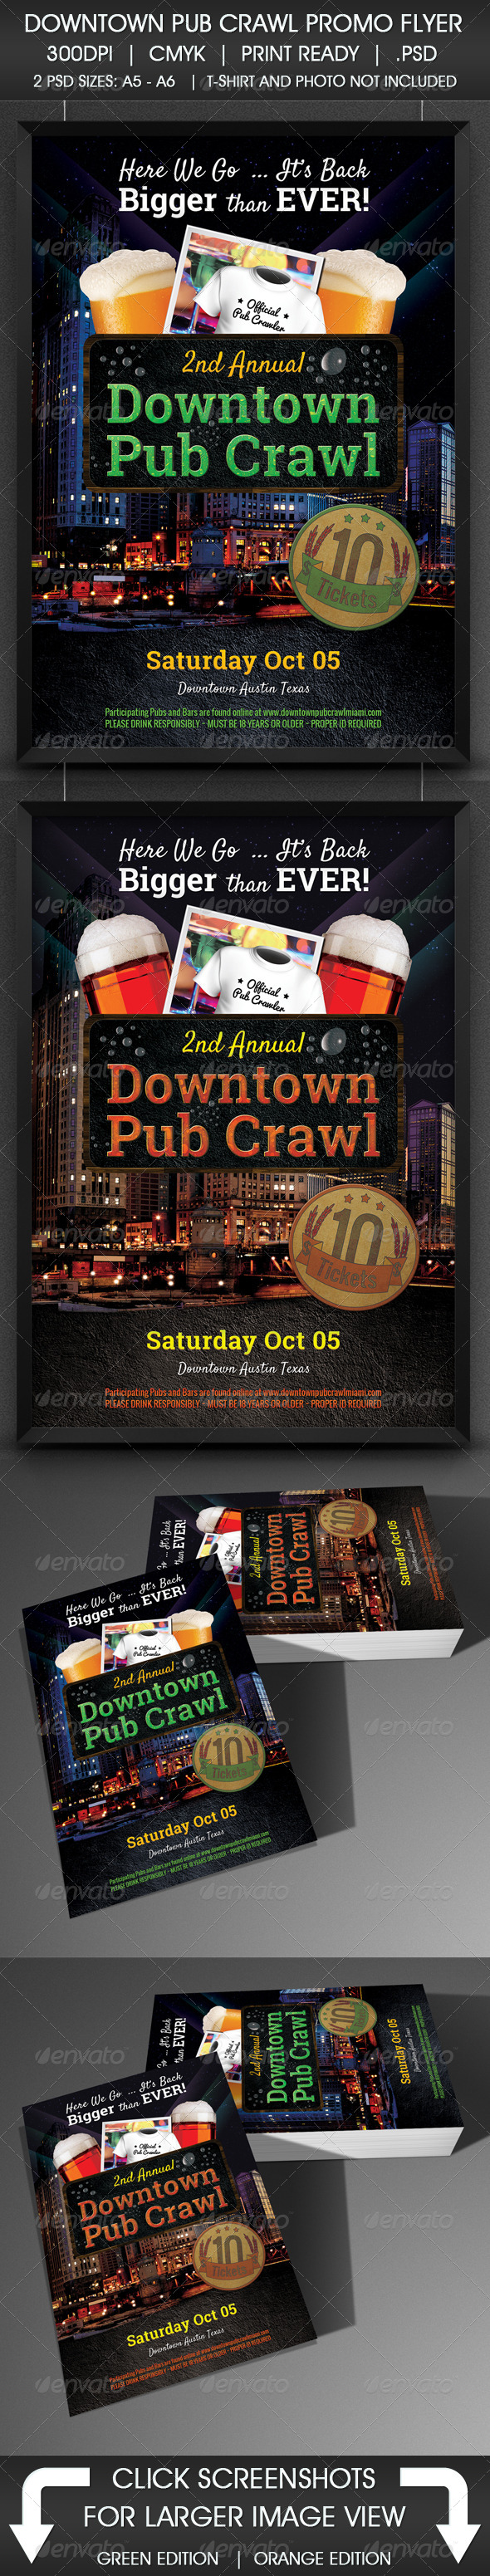 Downtown Pub Crawl Promo Flyer - Events Flyers